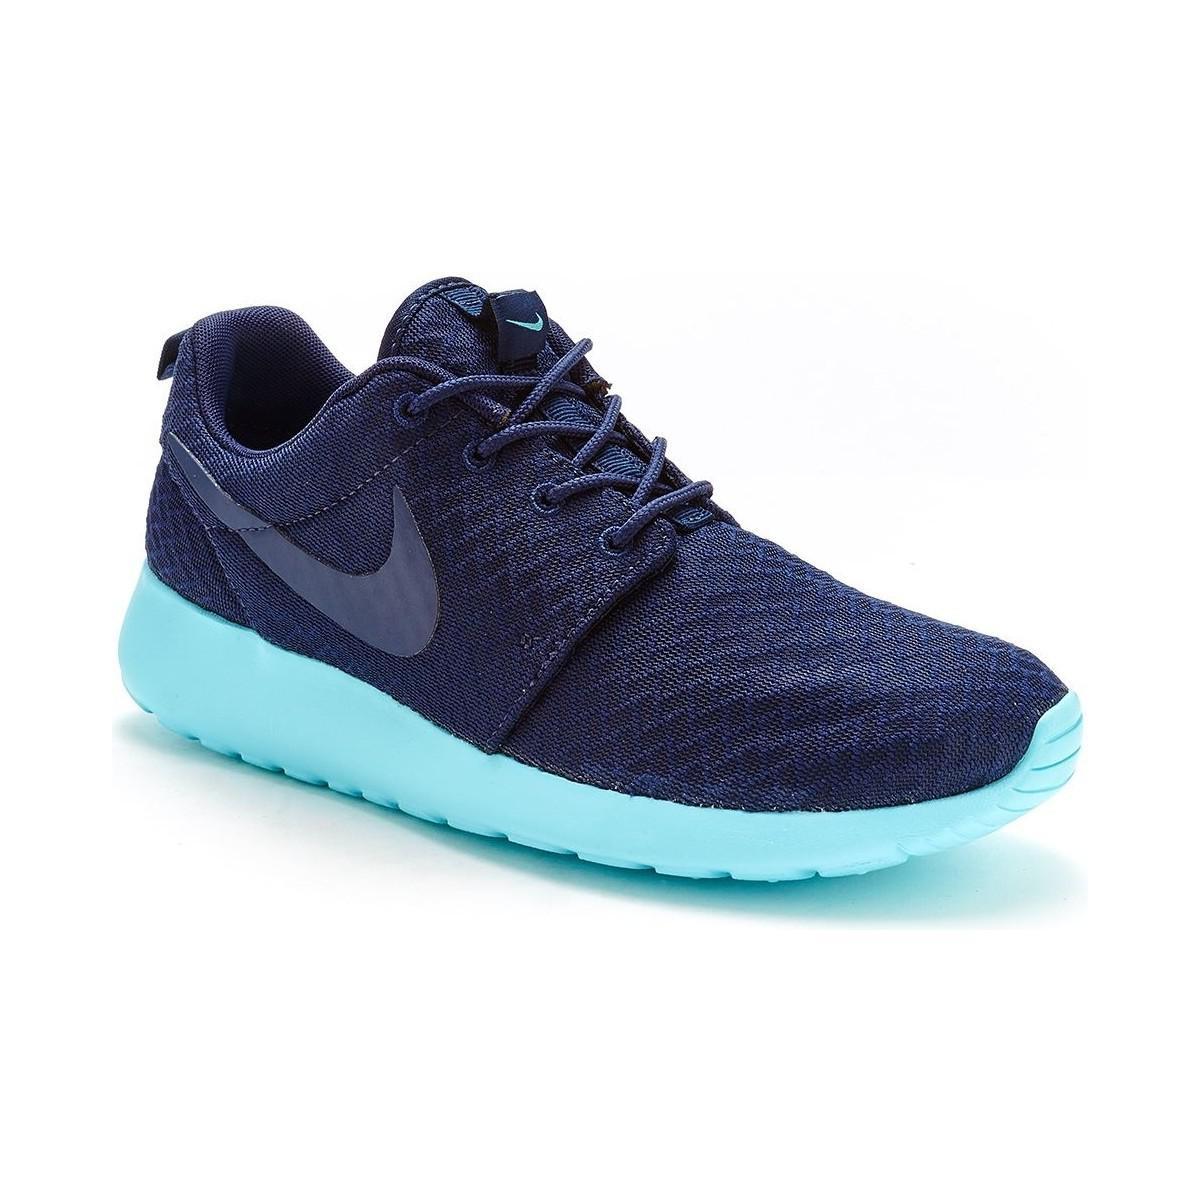 best website 7d89e e3072 Nike Roshe One Women Trainers In Midnight Navy Tide Pool Blue 5118 ...